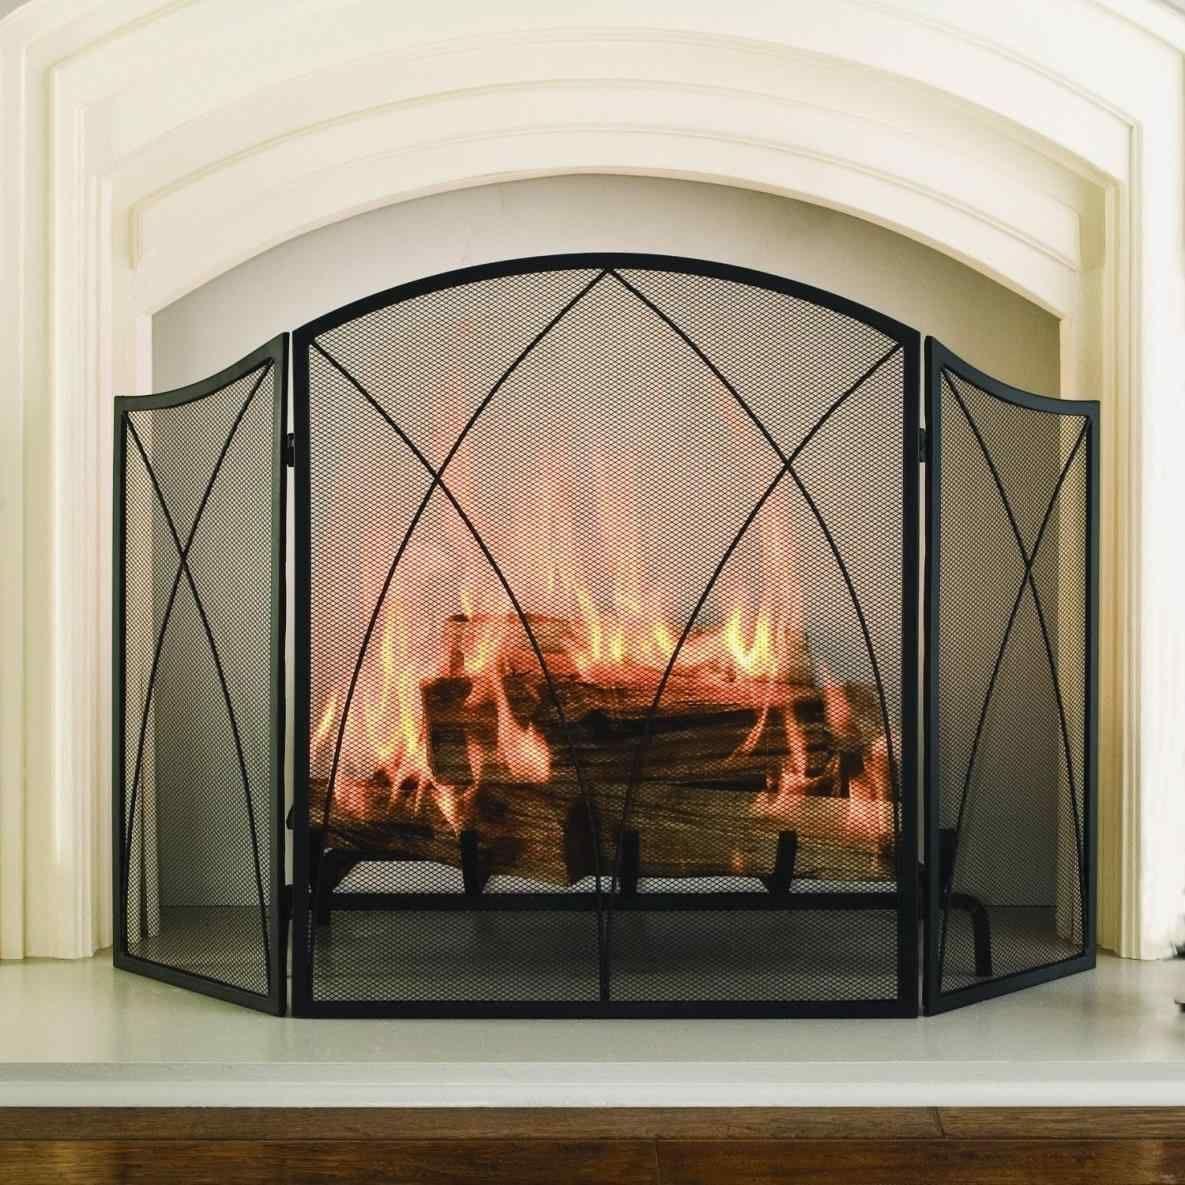 Cheap Fireplace Screens Luxury 11 Best Fancy Fireplace Screens Design and Decor Ideas